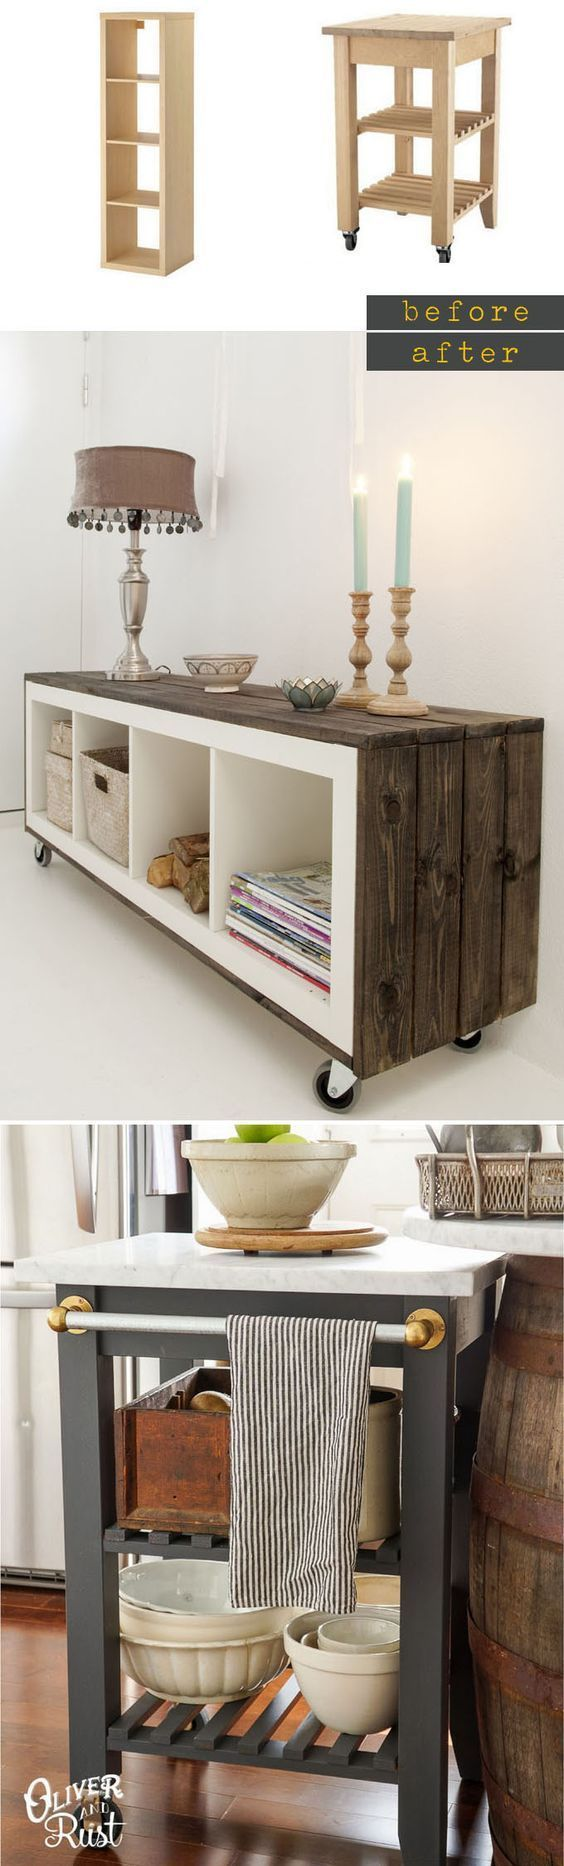 Custom Furniture Ideas - Modern Furniture Cheap Check more at http://searchfororangecountyhomes.com/custom-furniture-ideas/